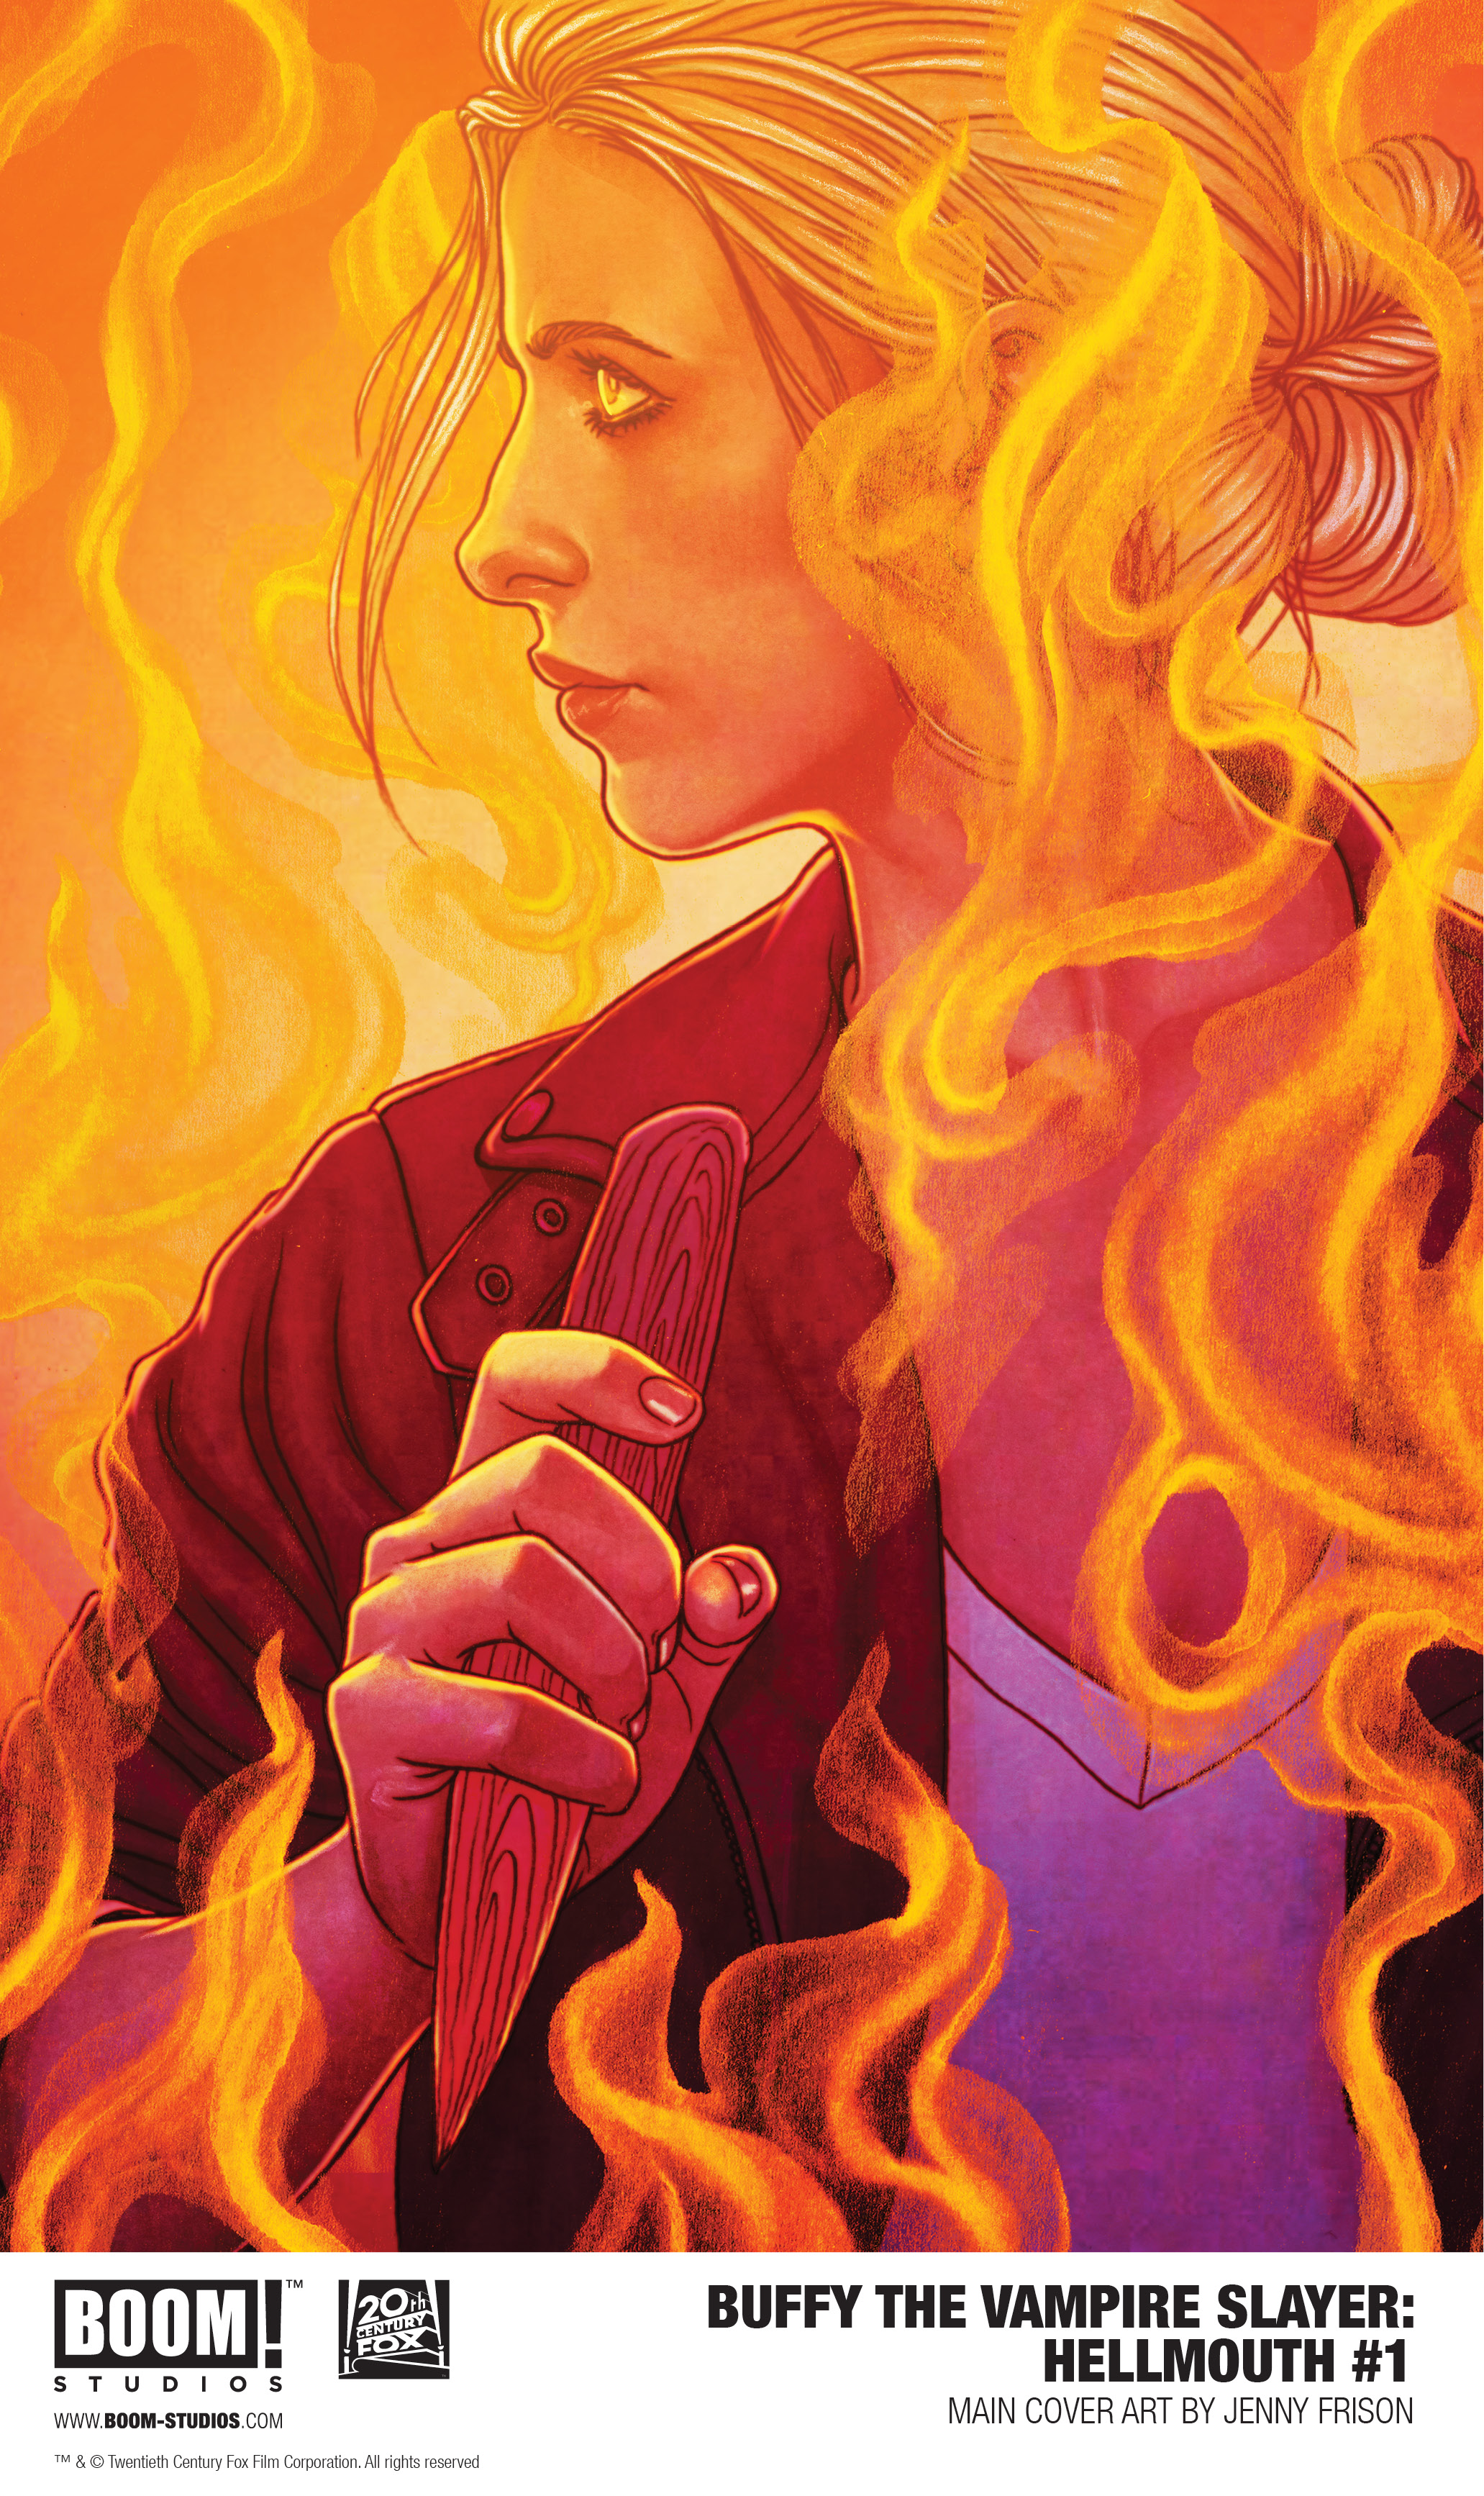 Buffy_Hellmouth_001_Main_Frison_Promo.jpg